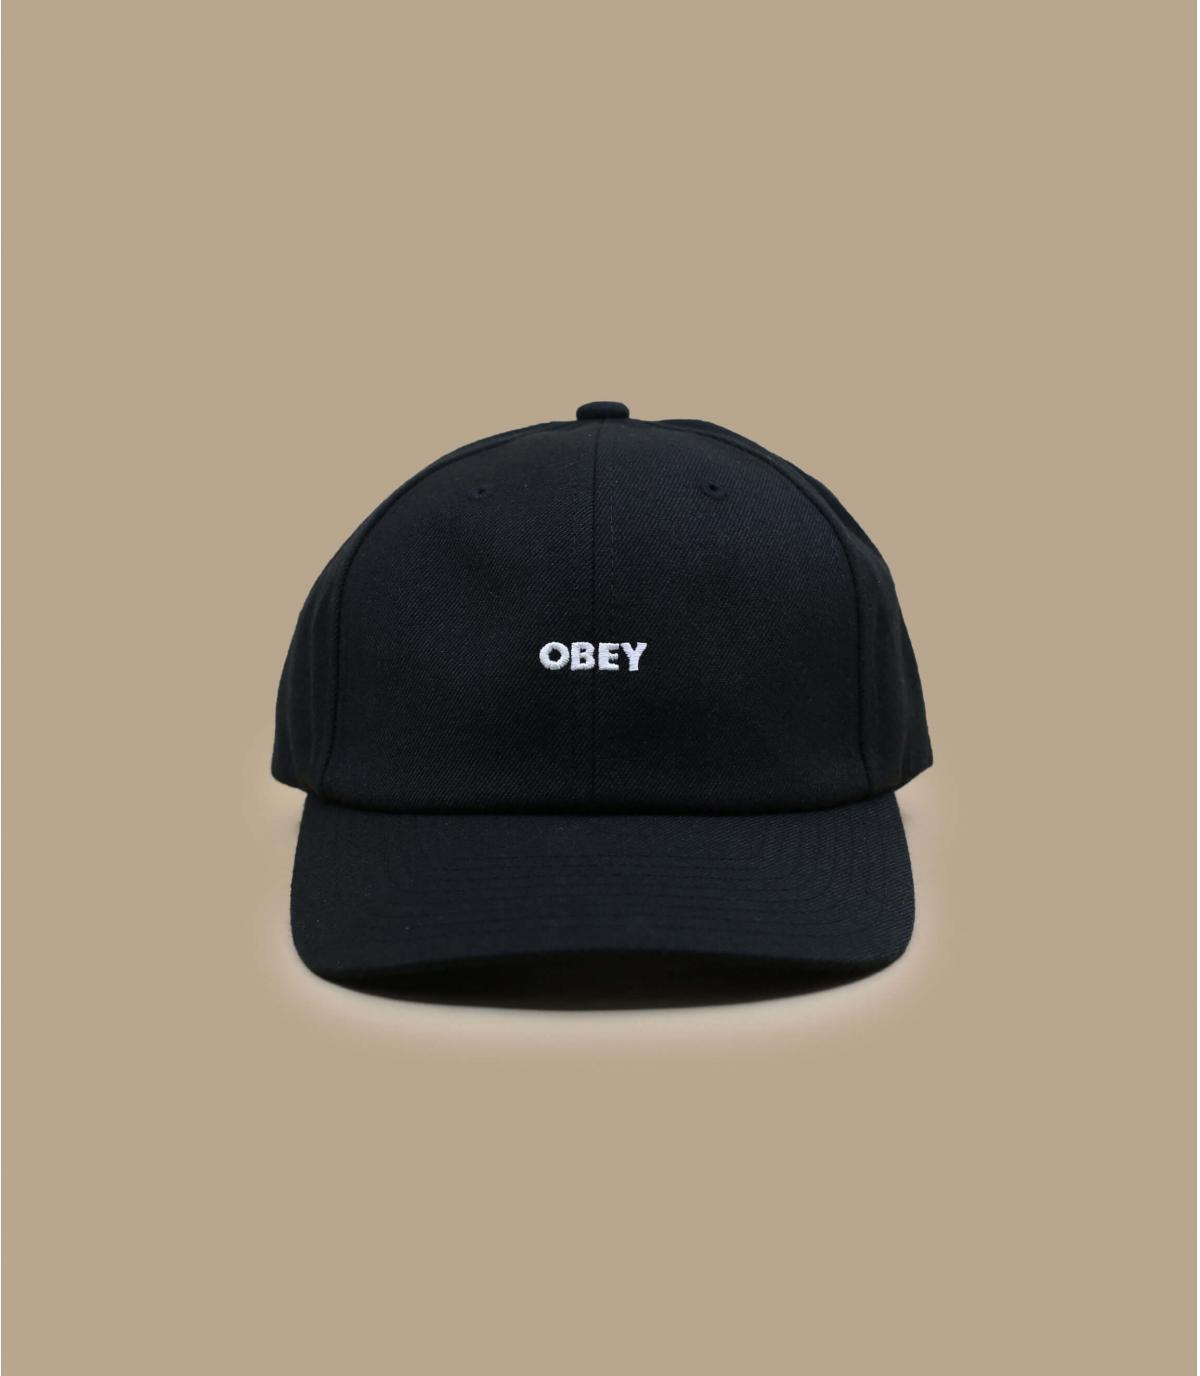 gorra Obey negro